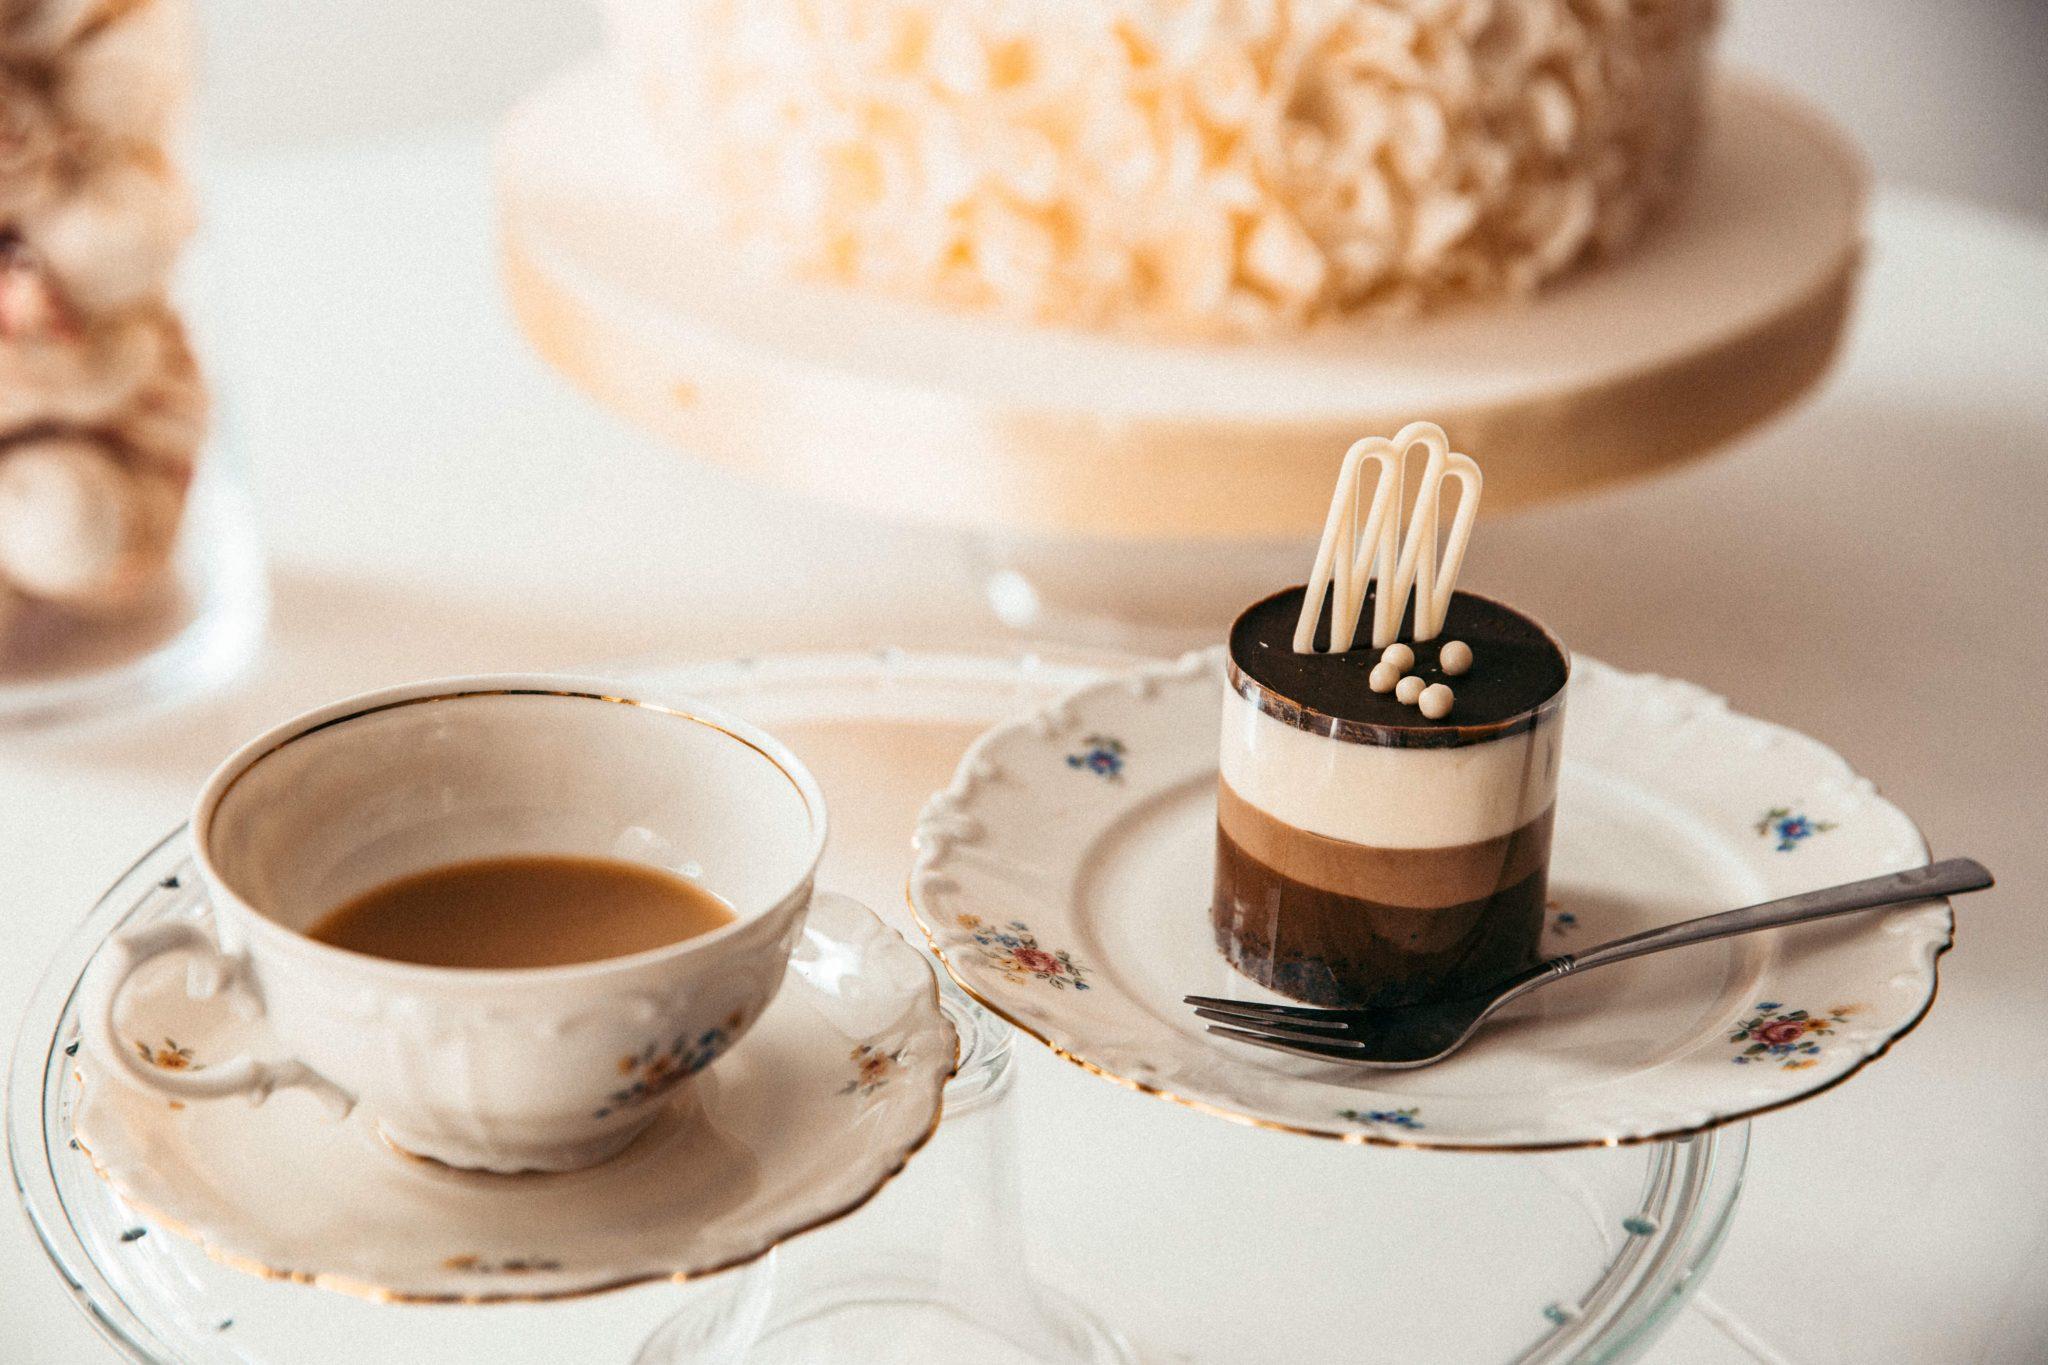 fotografie-comerciala-pentru-firme-barbaras-cakes-cofetarie-targu-mures-foto-majos-daniel-2